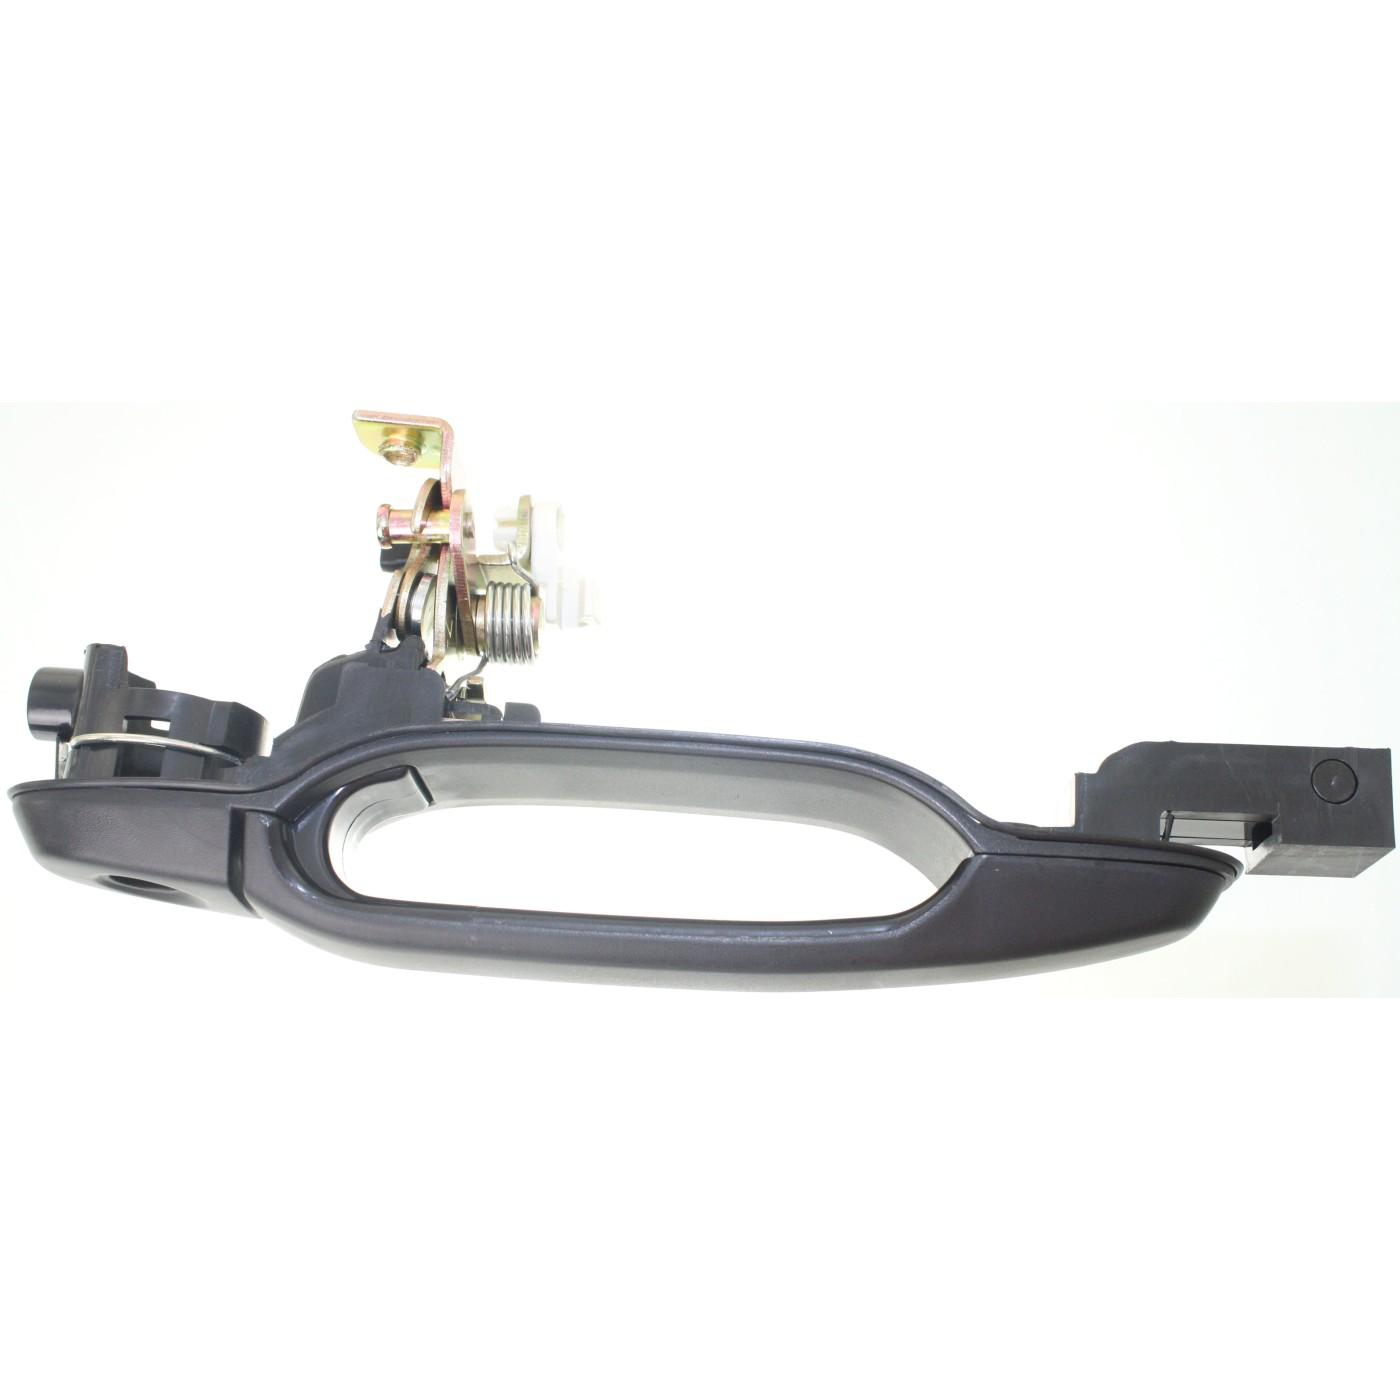 Exterior-Door-Handle-For-91-97-Toyota-Previa-Front-Driver-Side-Black-Plastic thumbnail 6